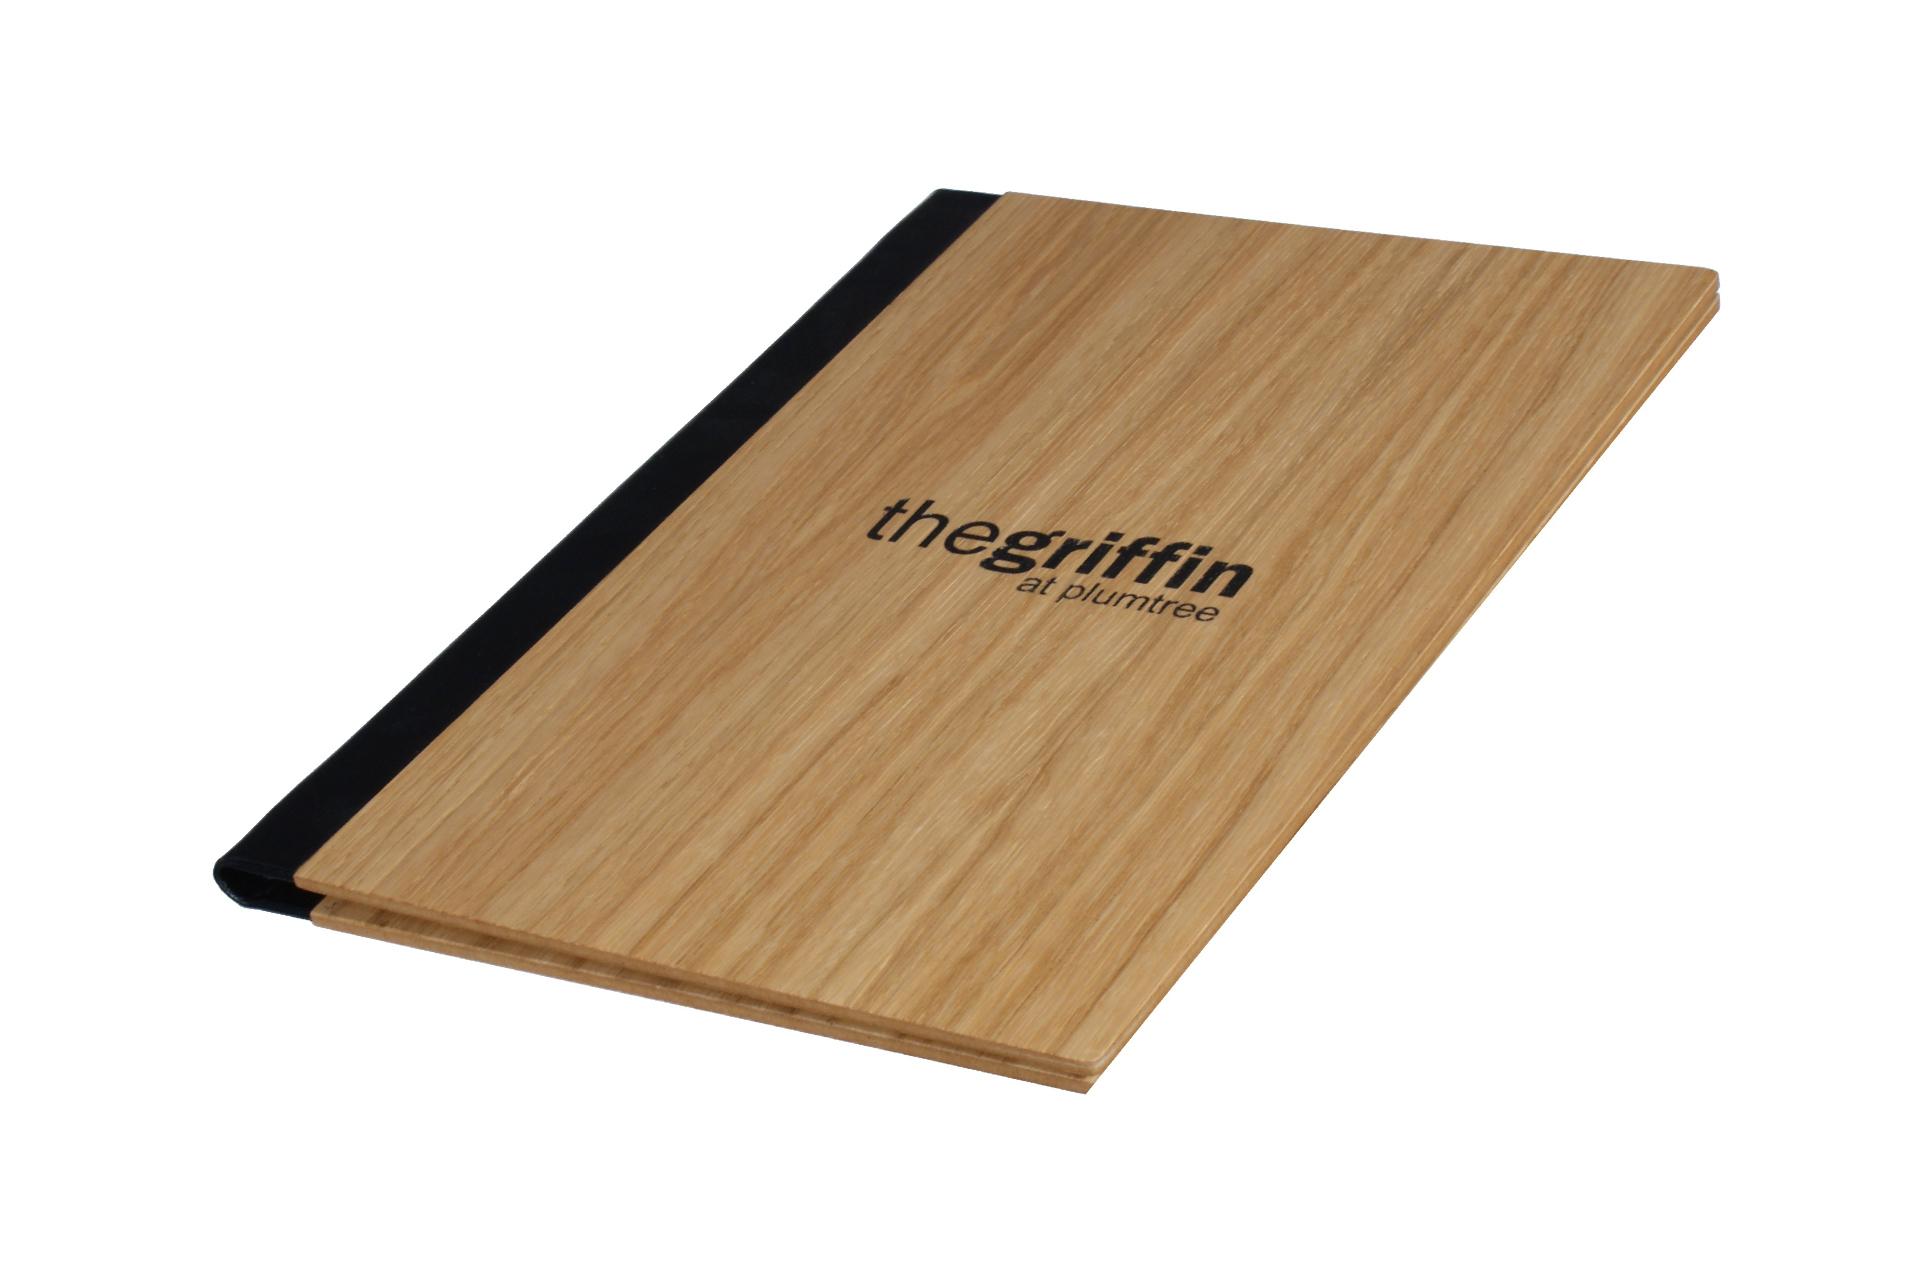 bespoke wooden folder for menus wine lists guest information folders hotels and restaurants